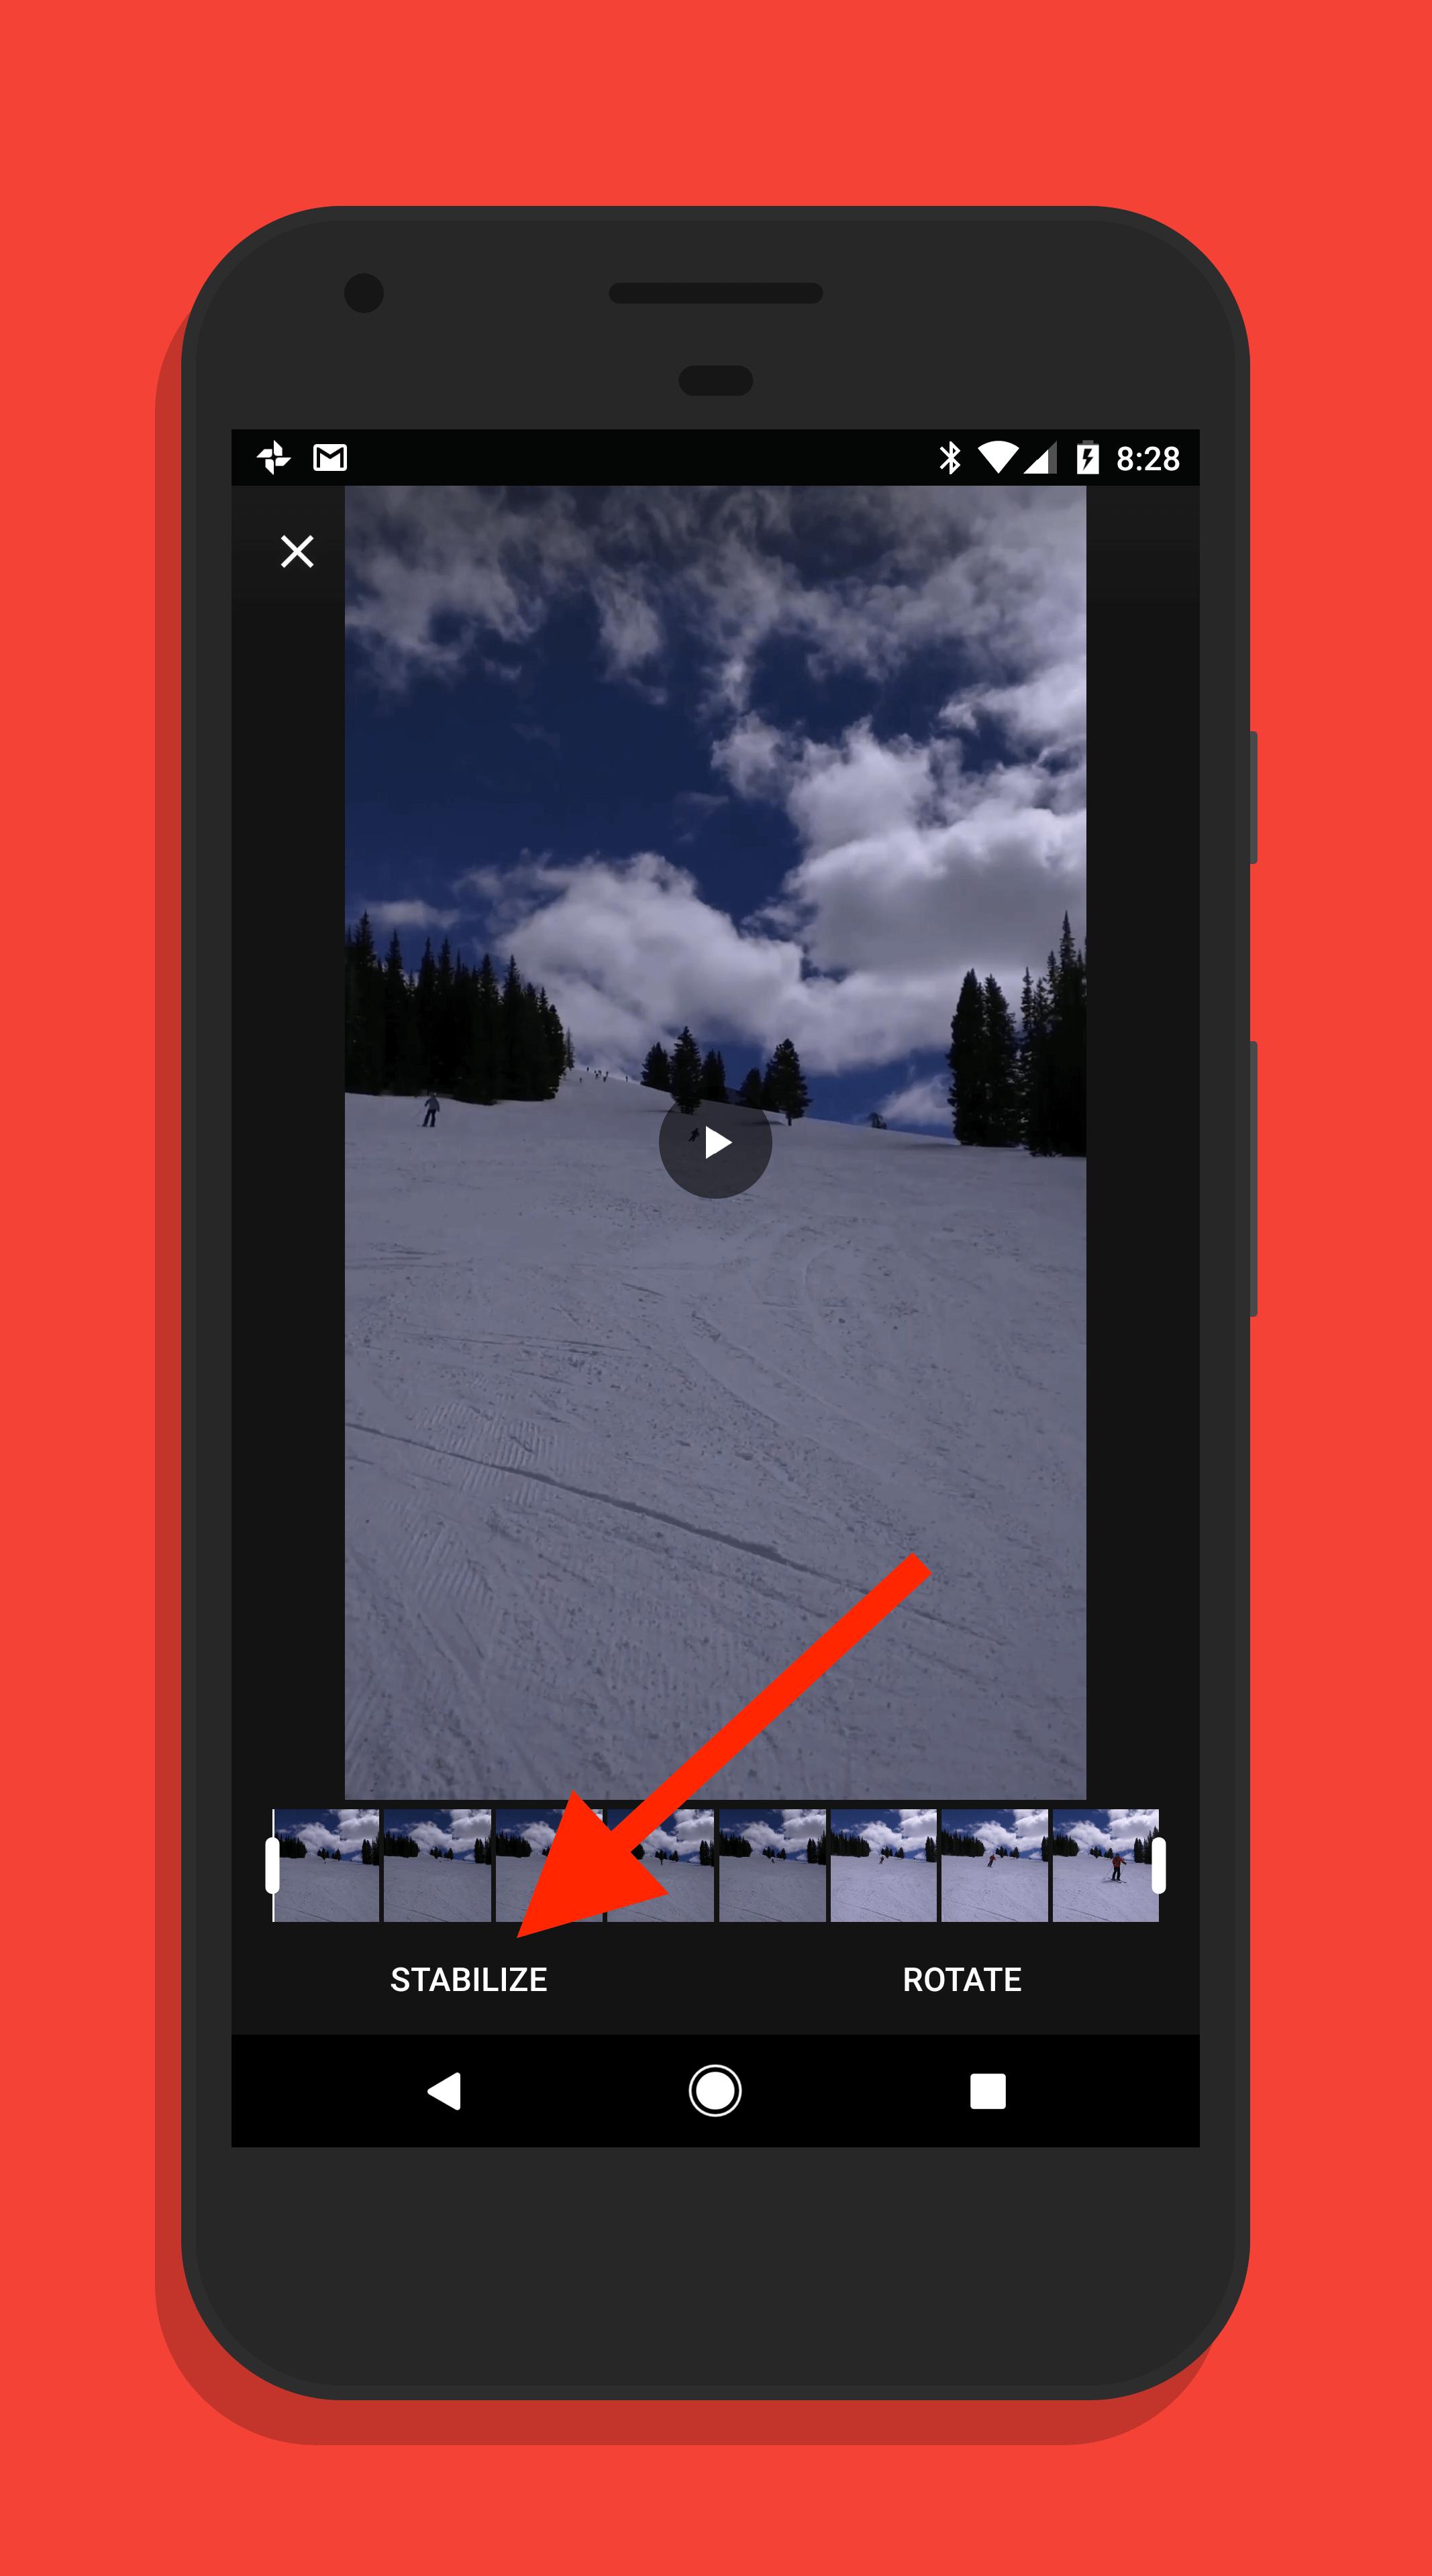 Video Stabilization in Google Photos